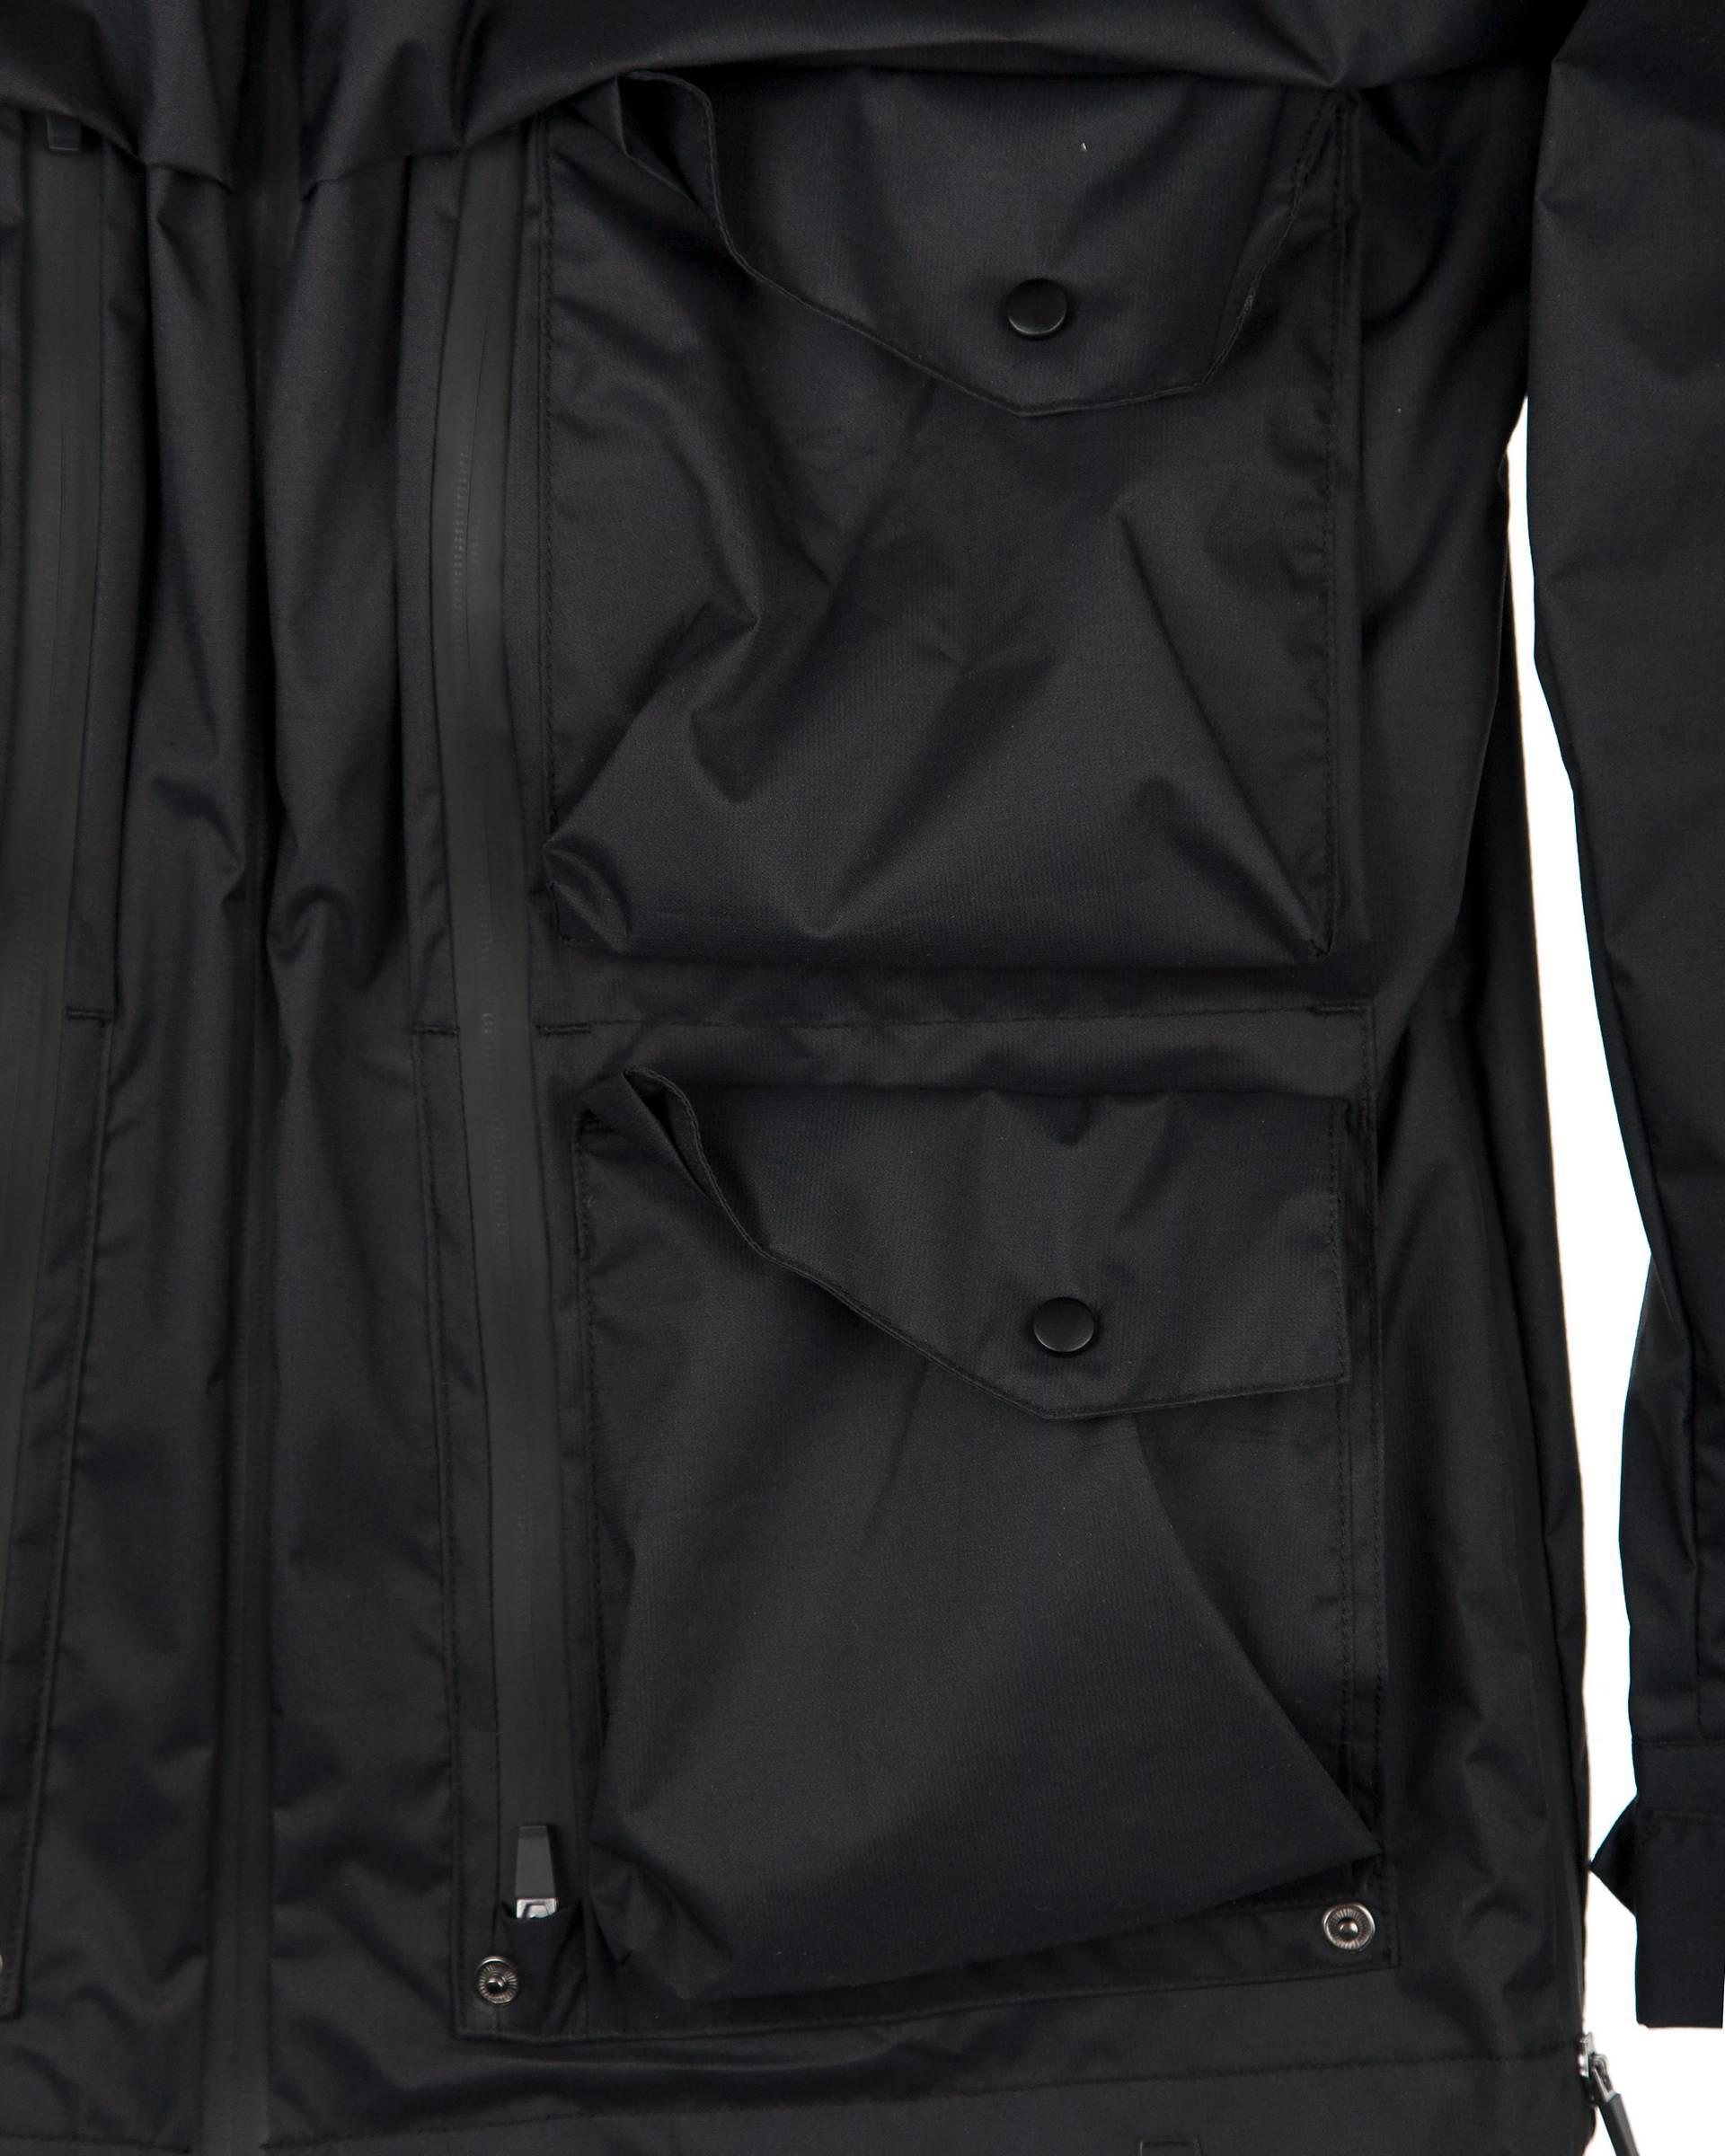 Ветровка Riot Division M-65 Transformer Black Jacket